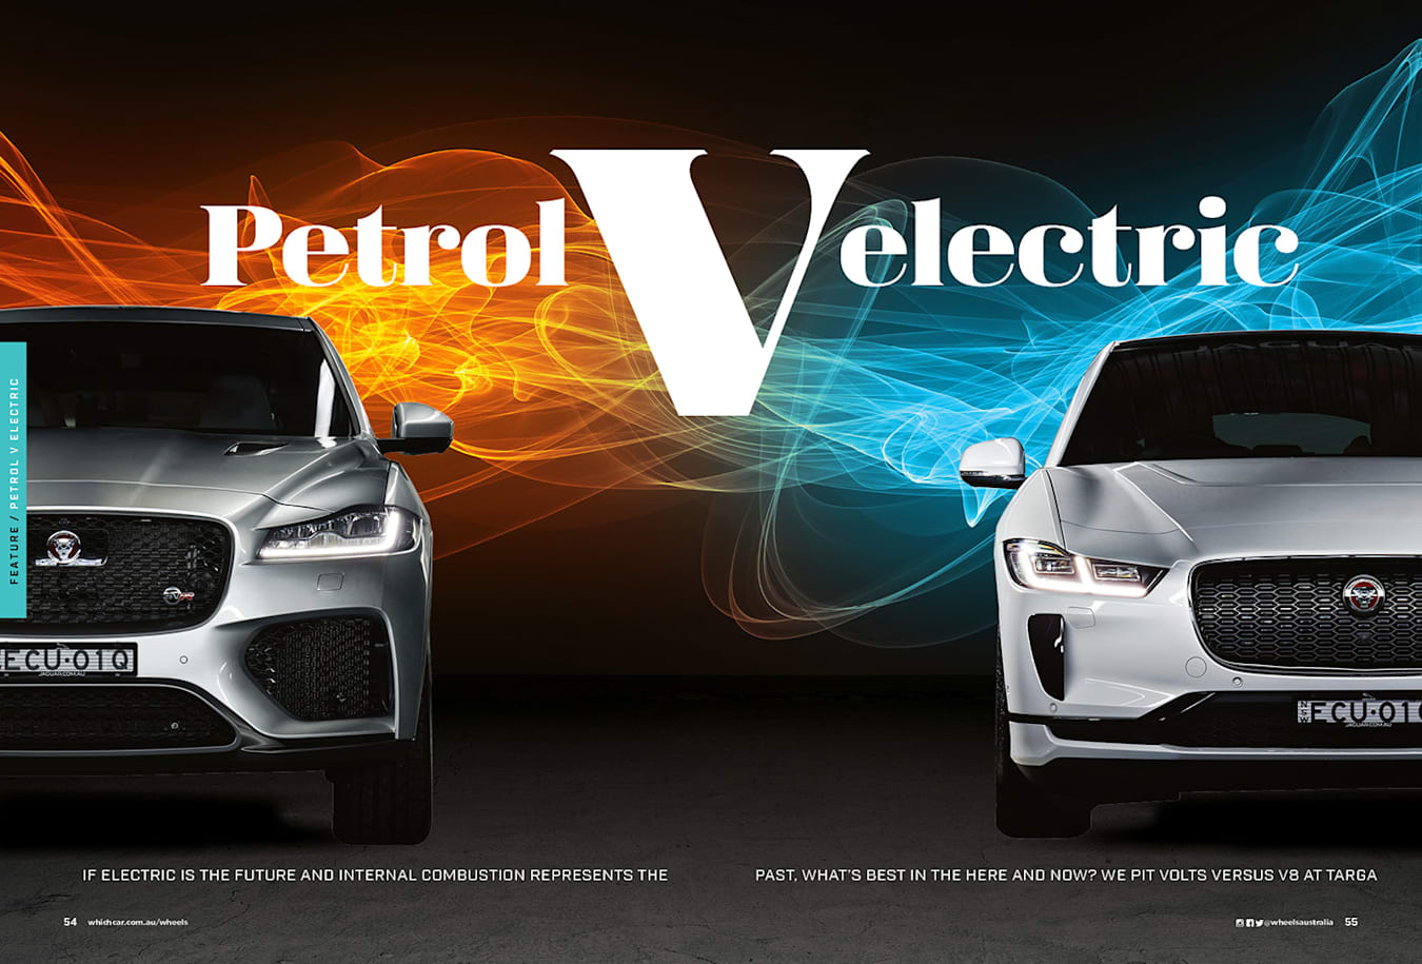 Jaguar Petrol vs Electric